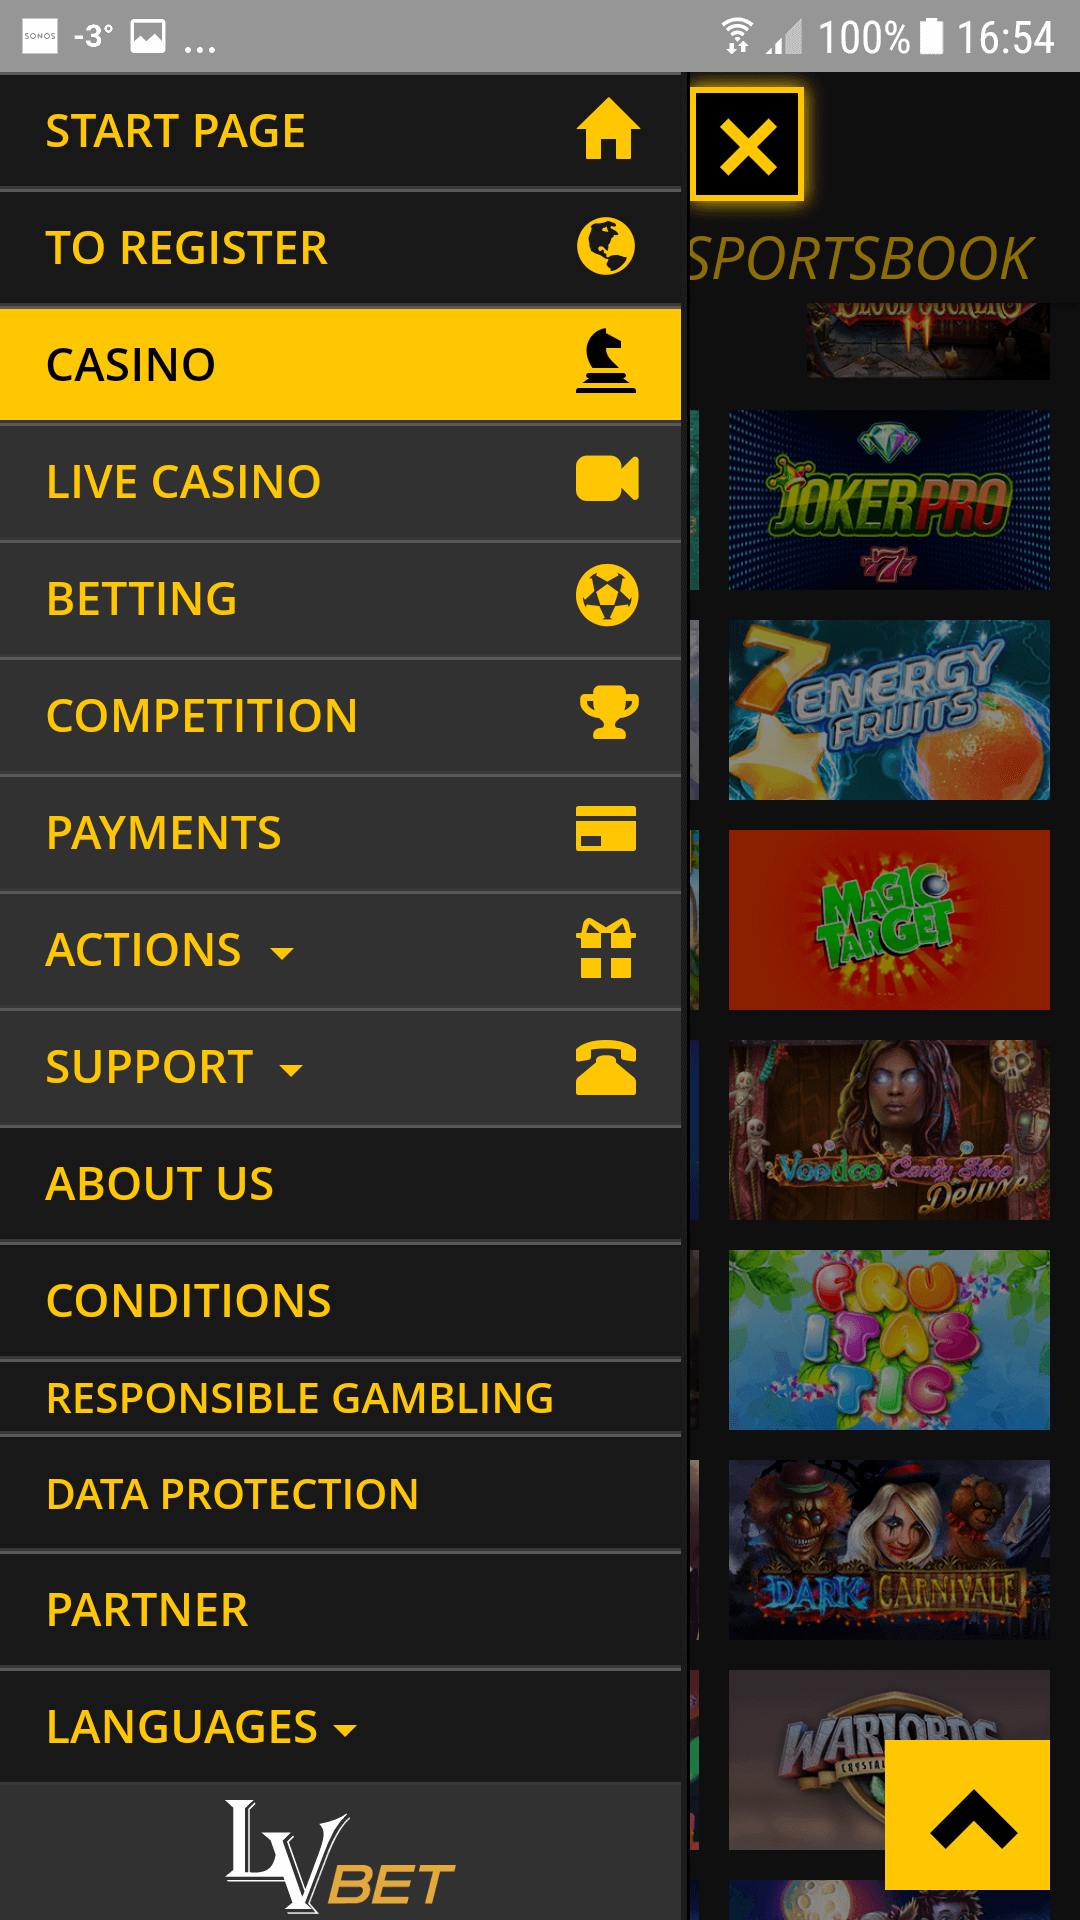 Optimal blackjack betting strategy